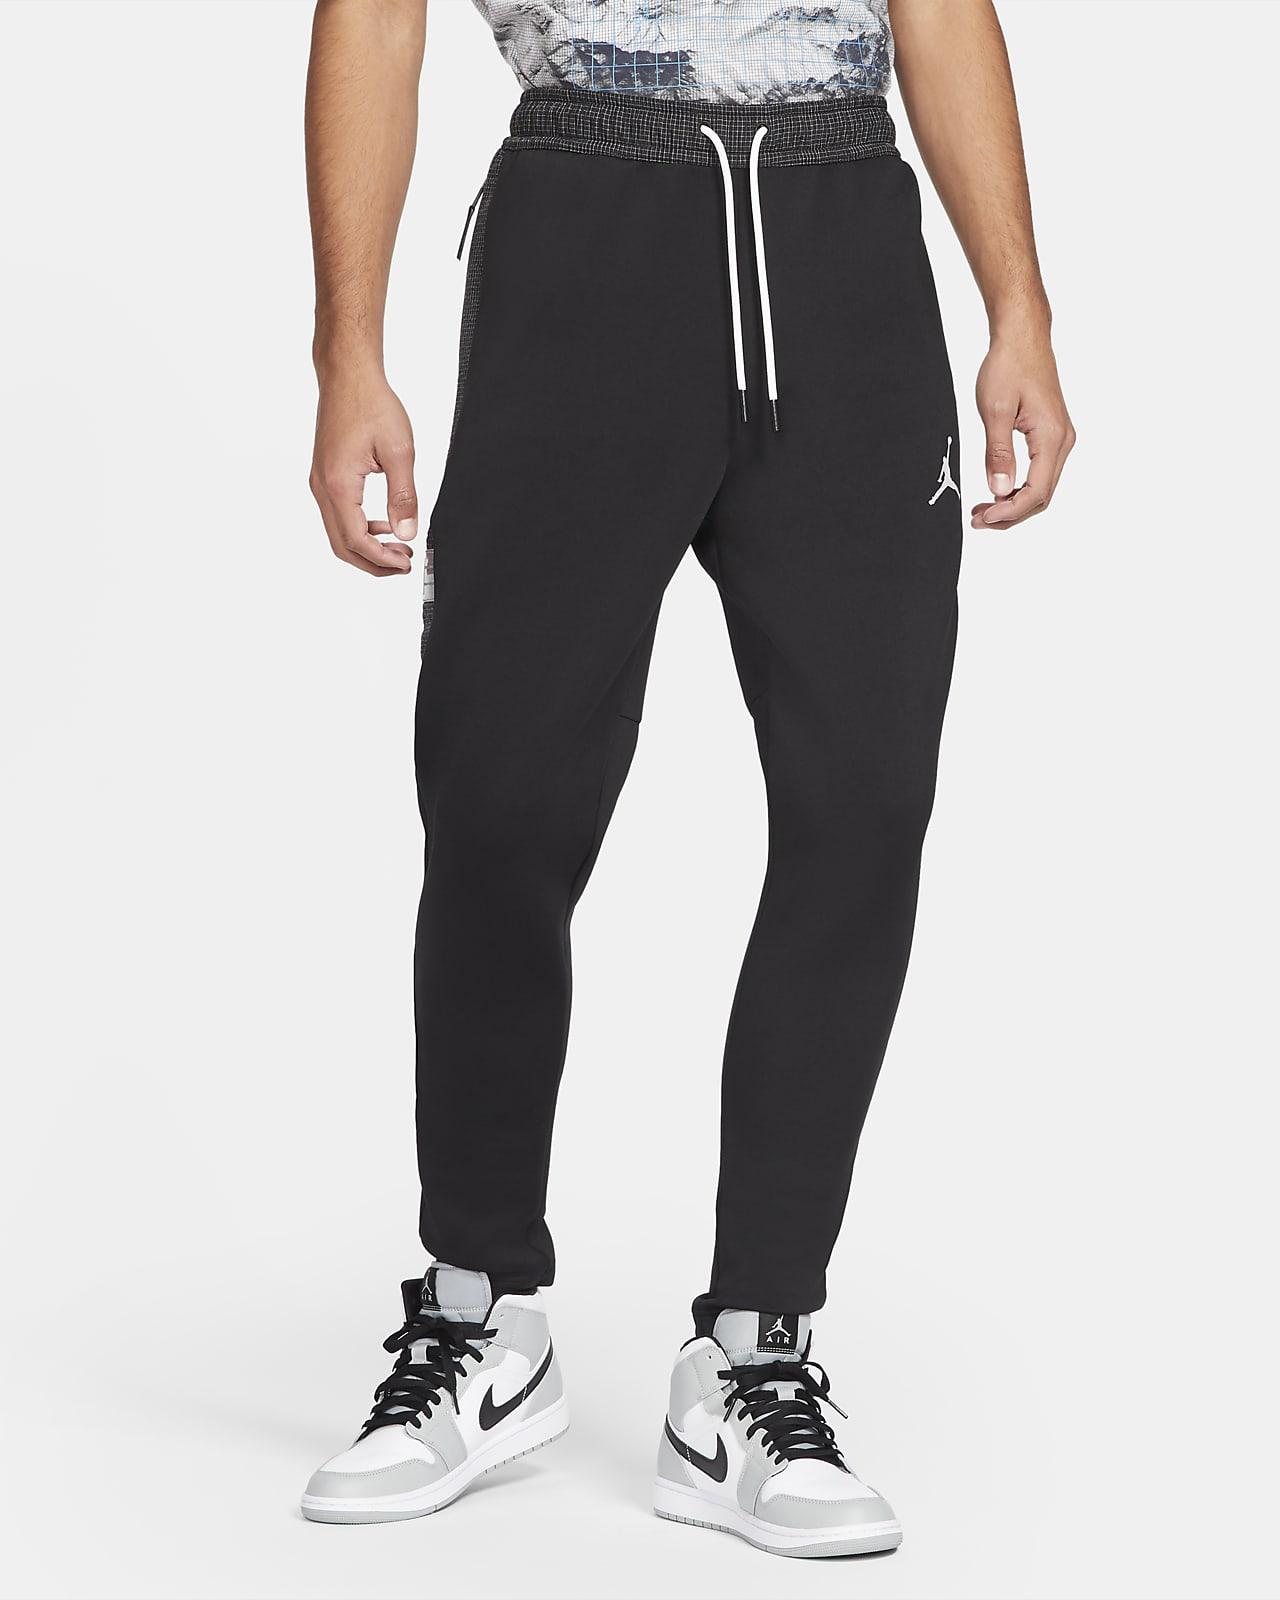 Jordan Air Men's Fleece Trousers